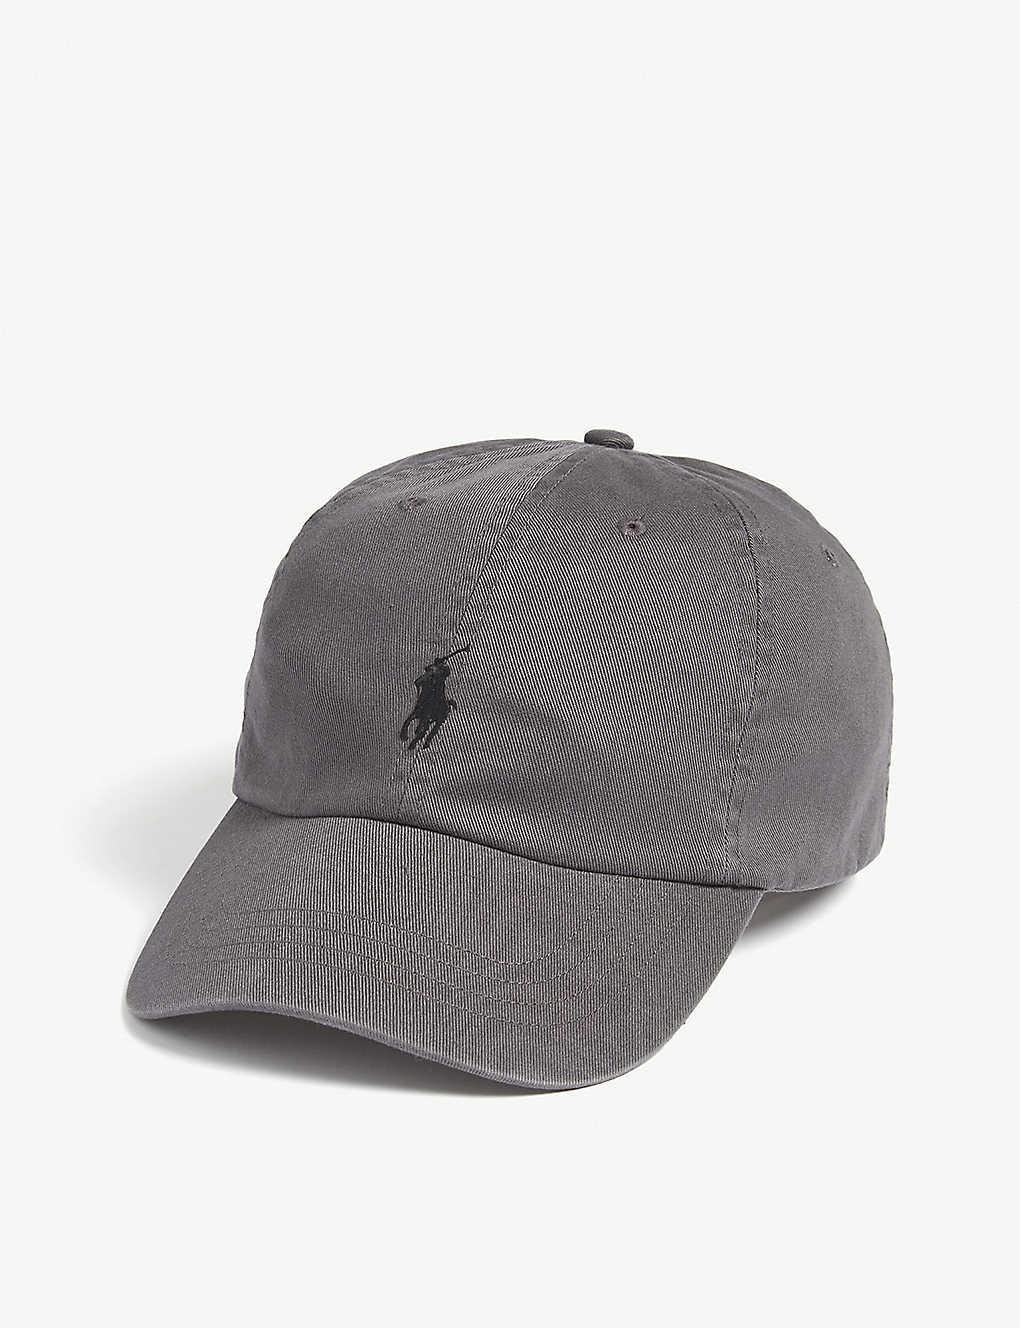 01c0858c POLO RALPH LAUREN - Pony baseball cap | Selfridges.com